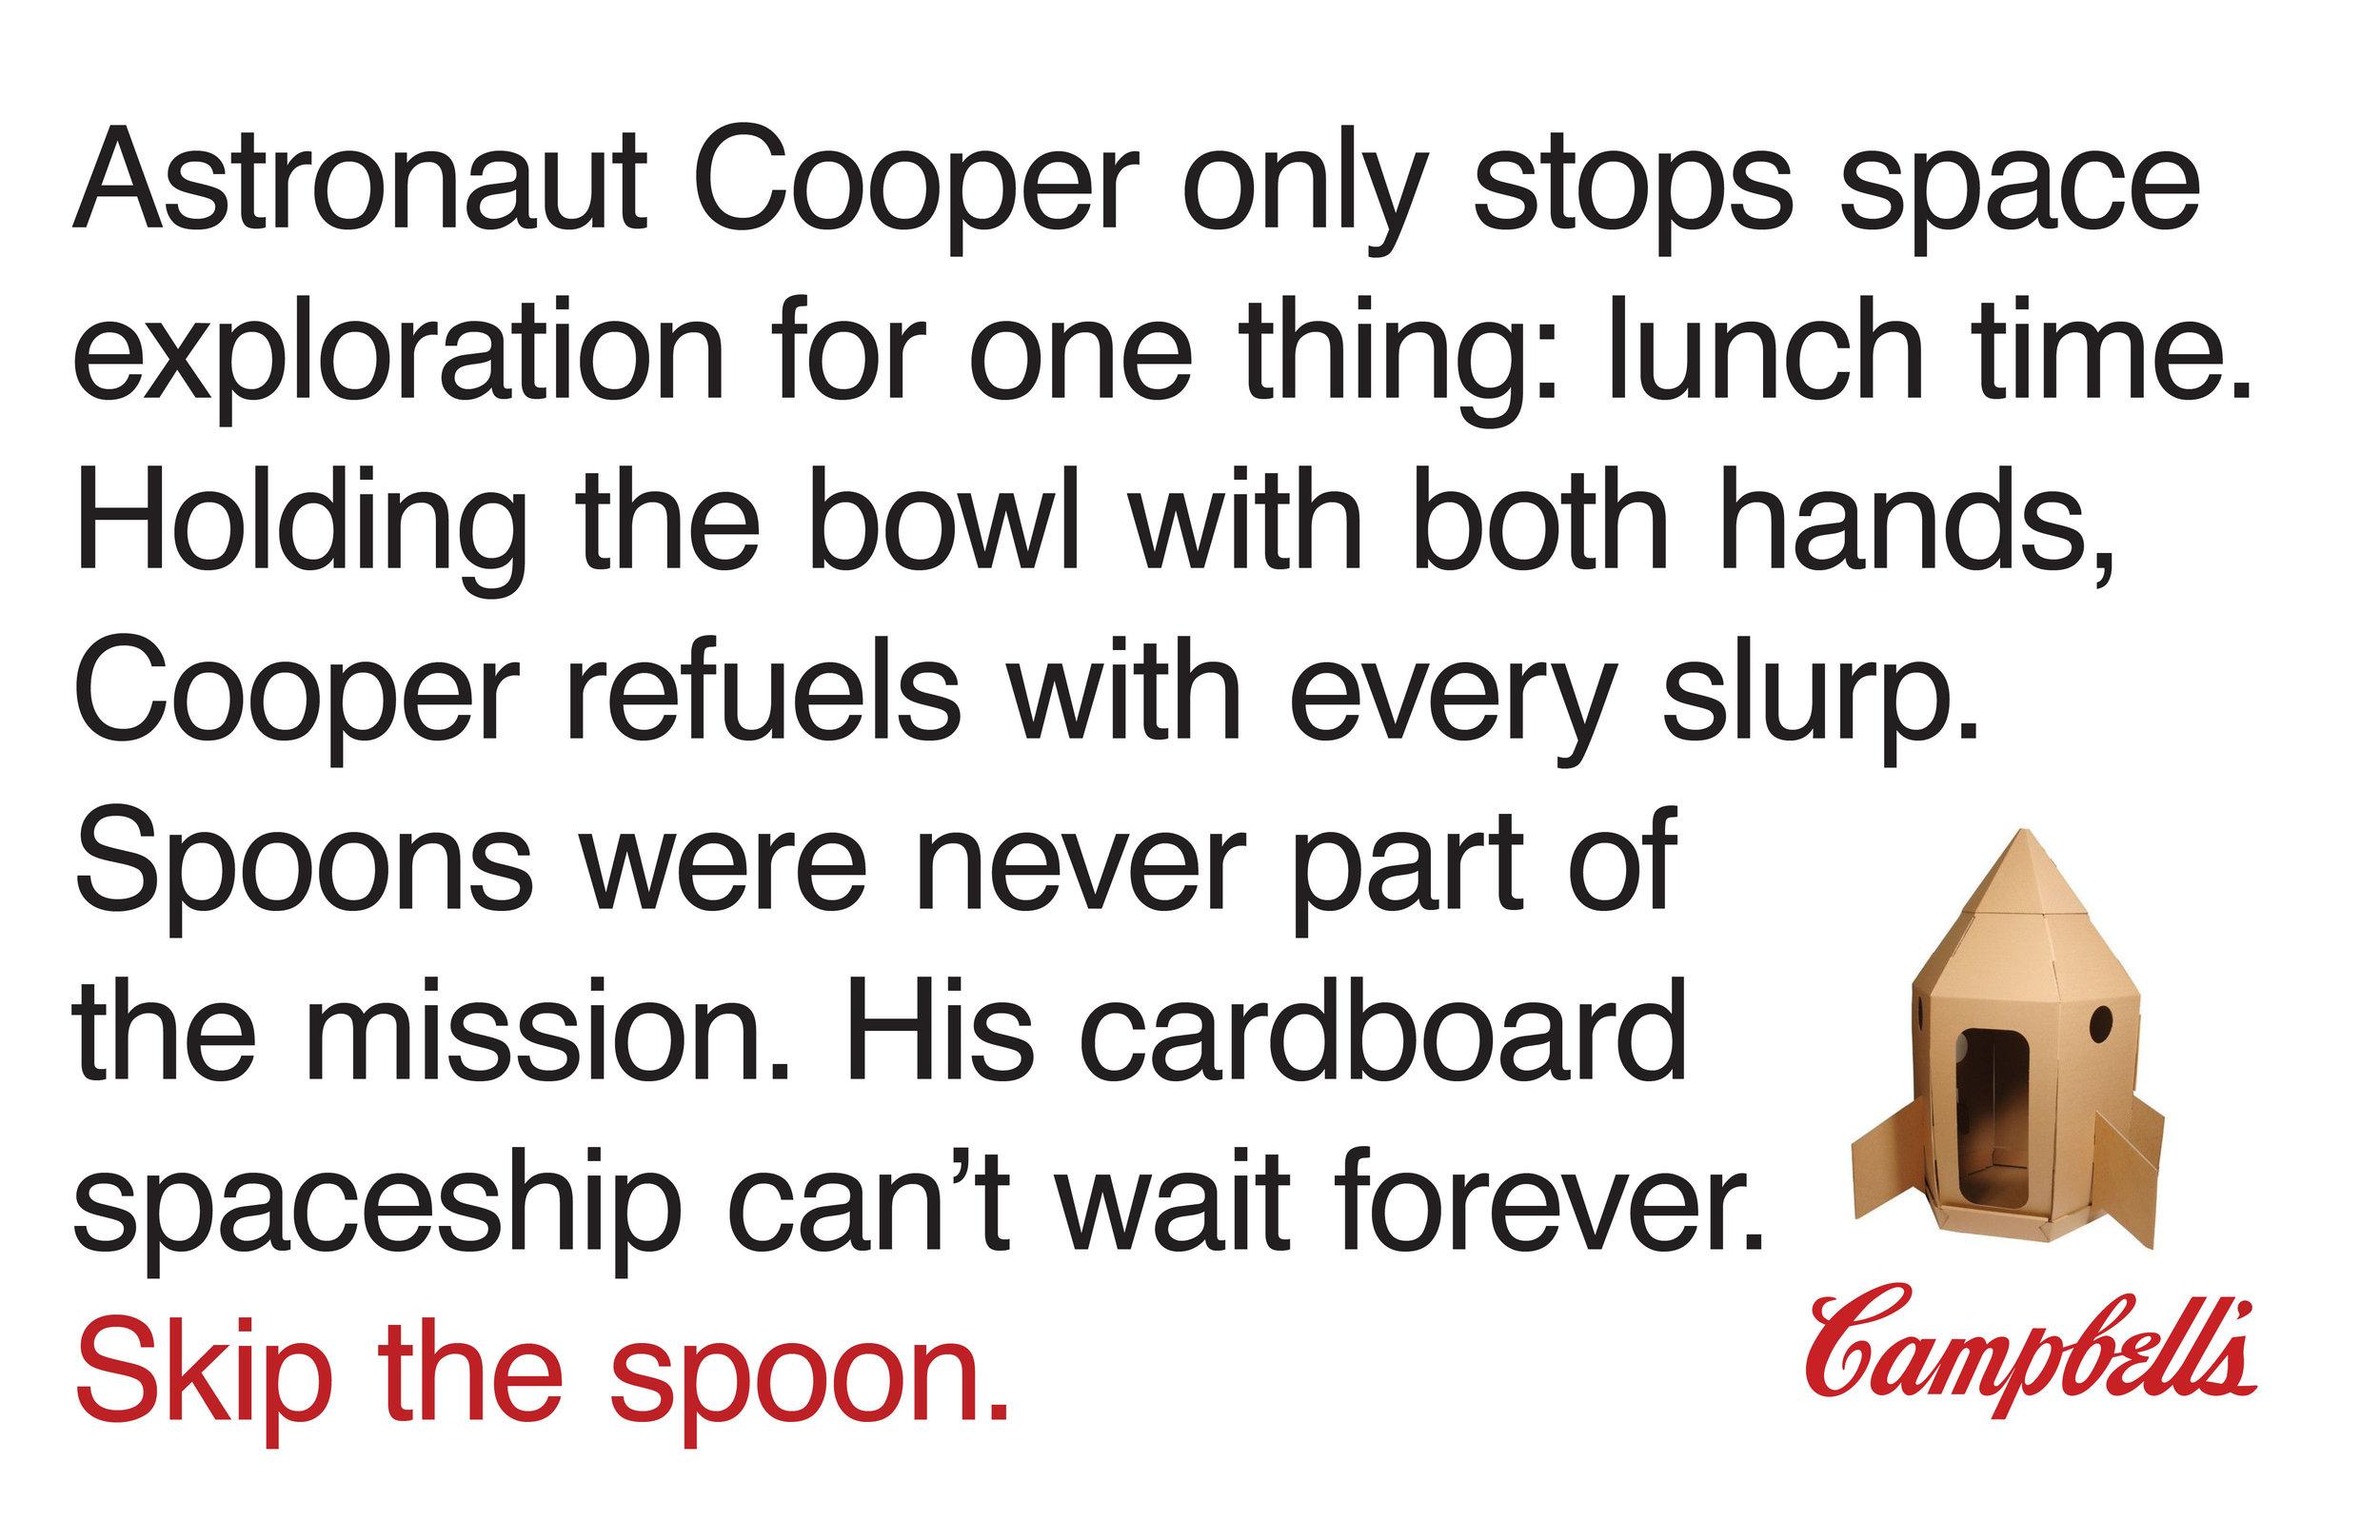 Campbell's Soup Horizontal 1.jpeg